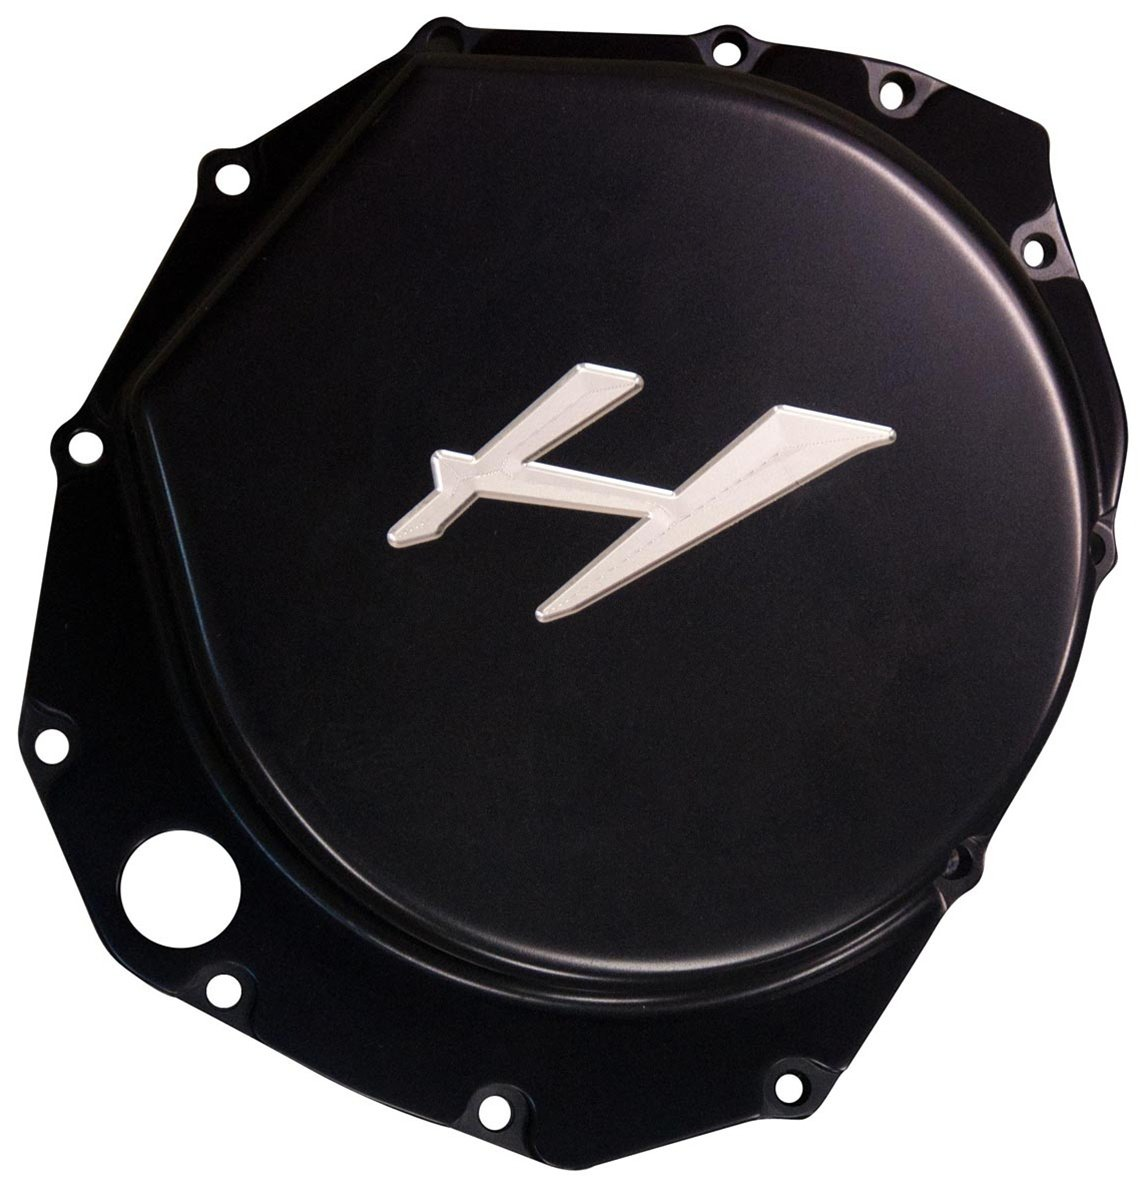 GSX-R 1300 Hayabusa (99-13) & B-King Anodized Black Clutch Cover  ( #A4309ABH)